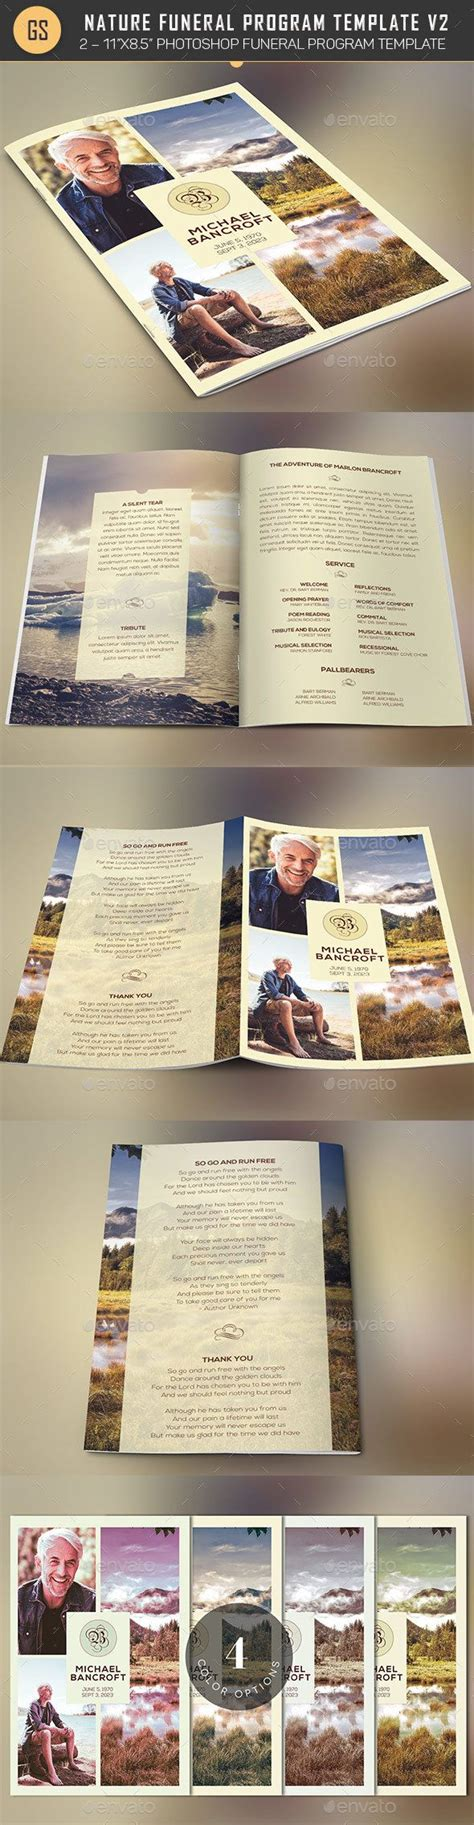 free funeral program templates memorial album templates